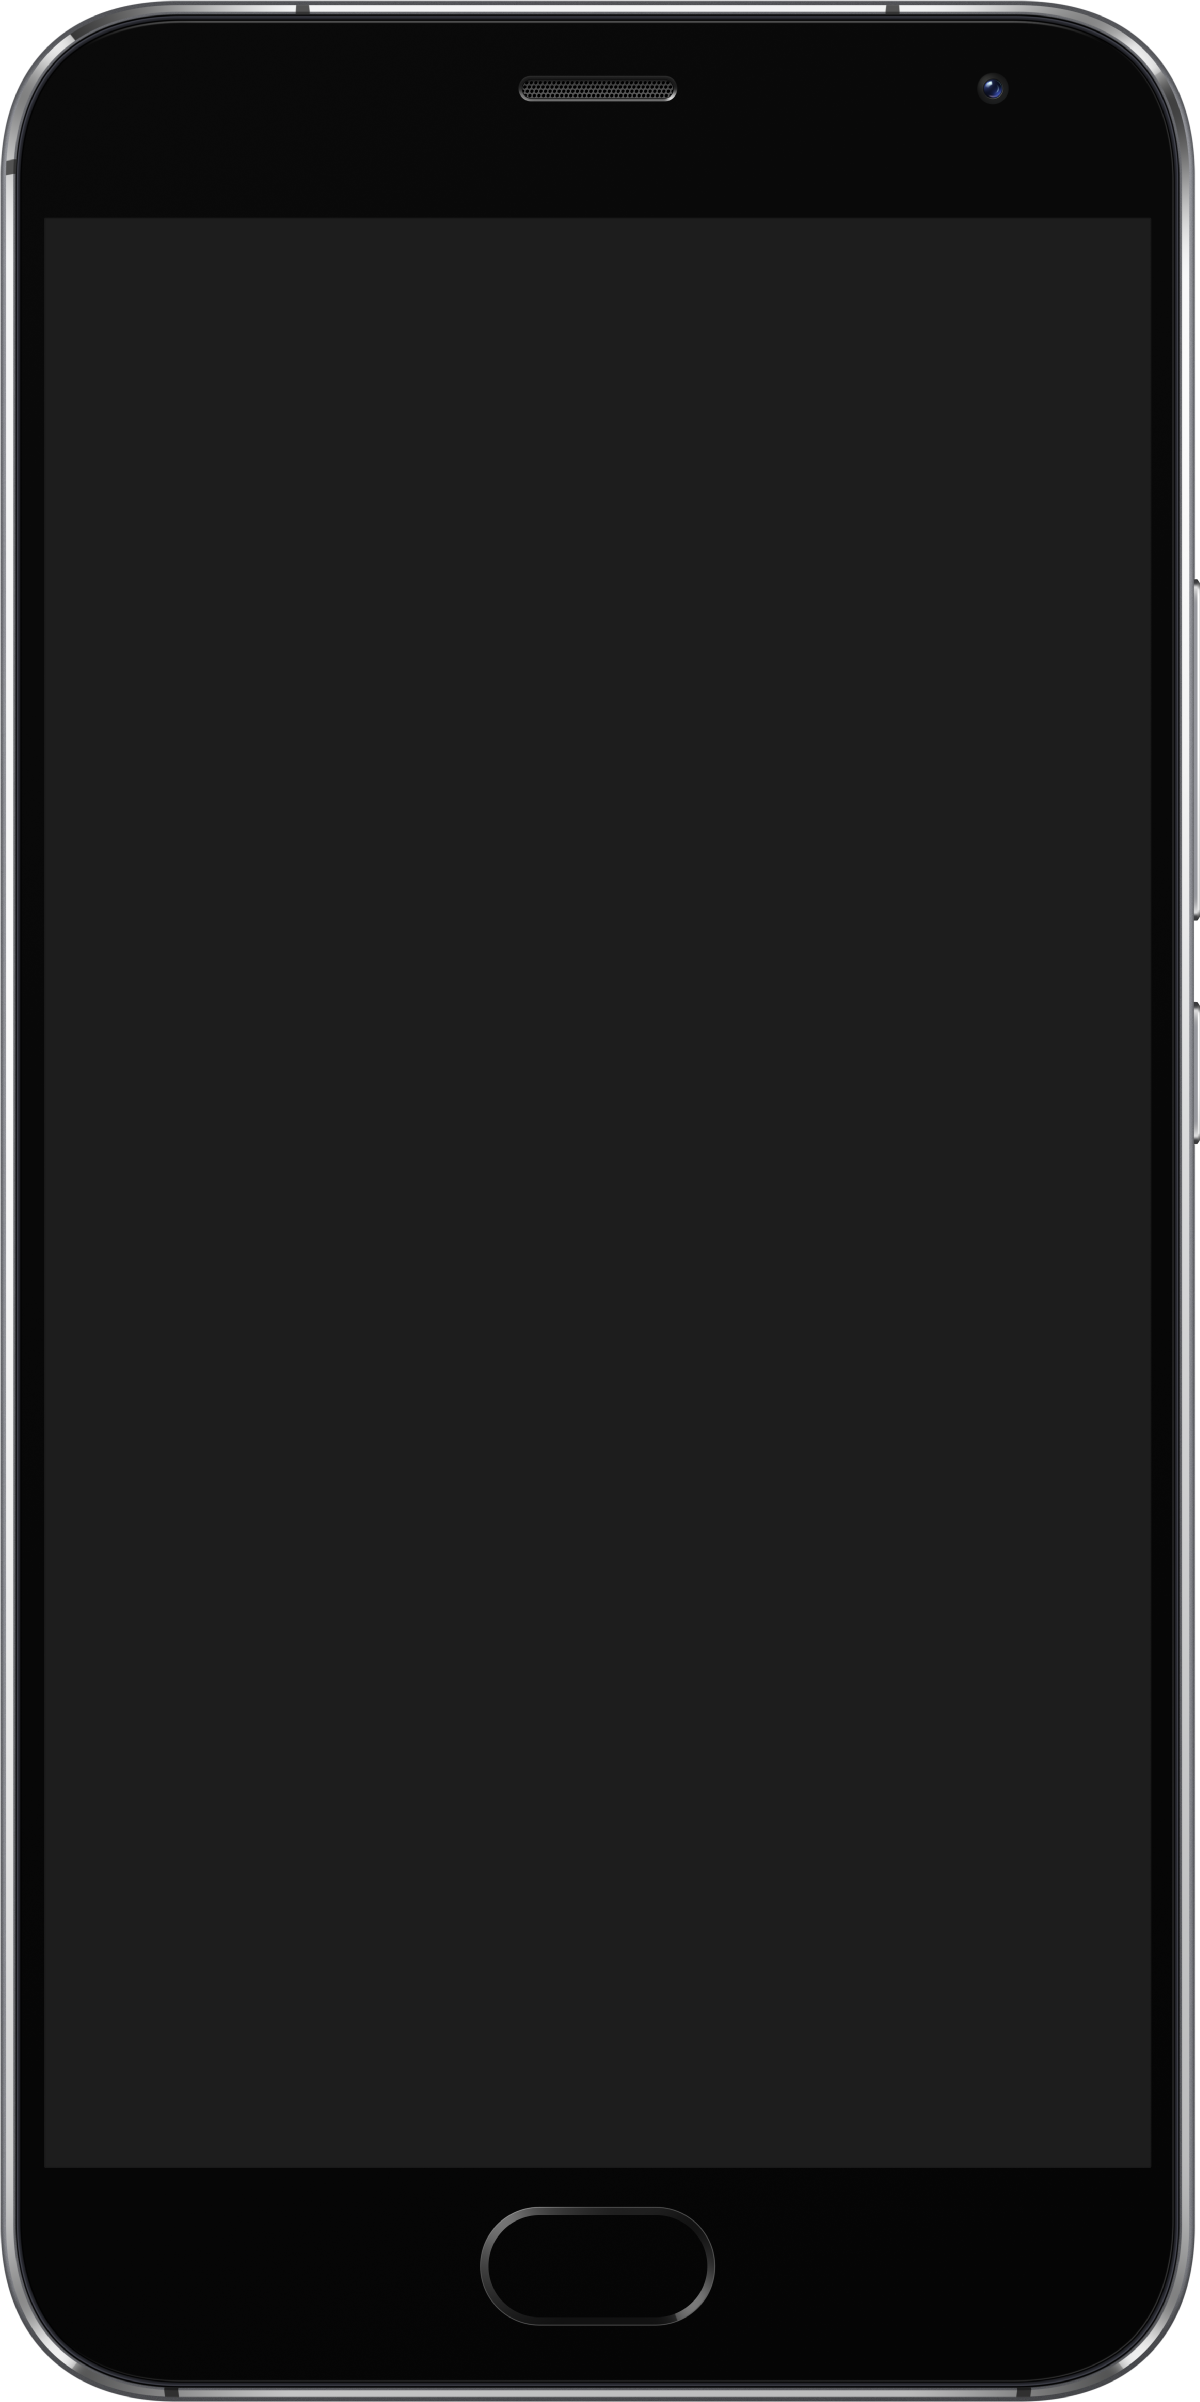 Meizu PRO 5 Ubuntu Edition - Wikipedia